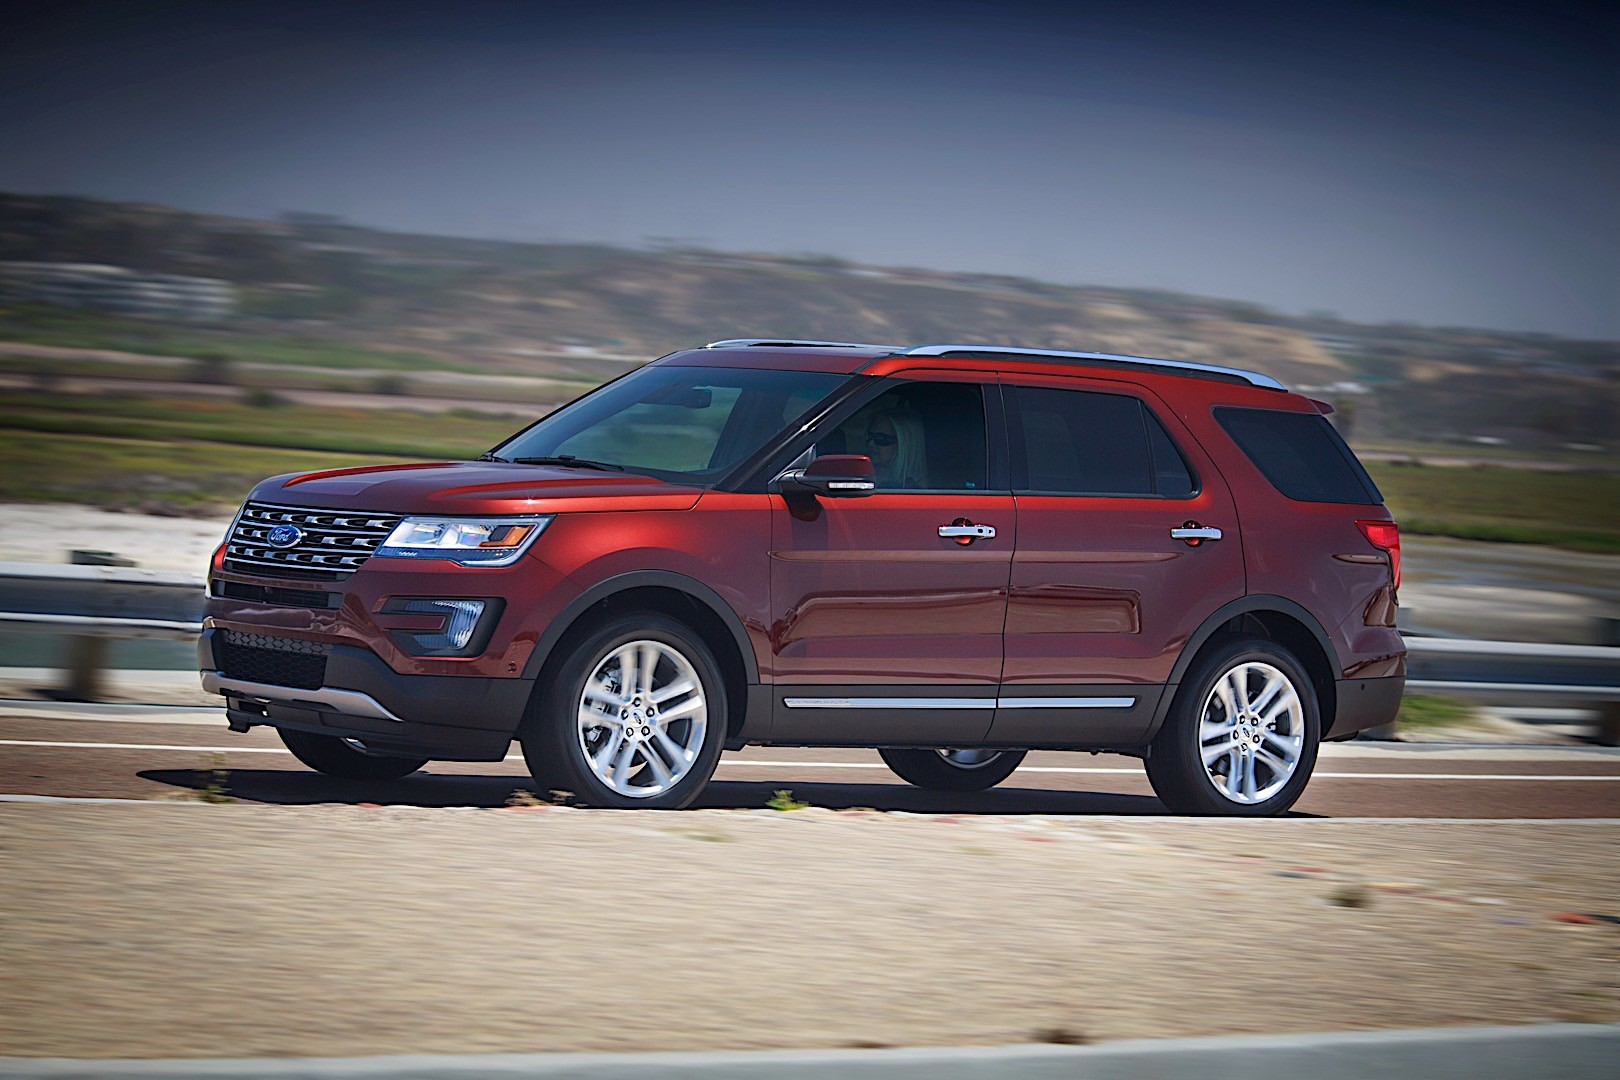 ford explorer jeep autoevolution cherokee grand vs